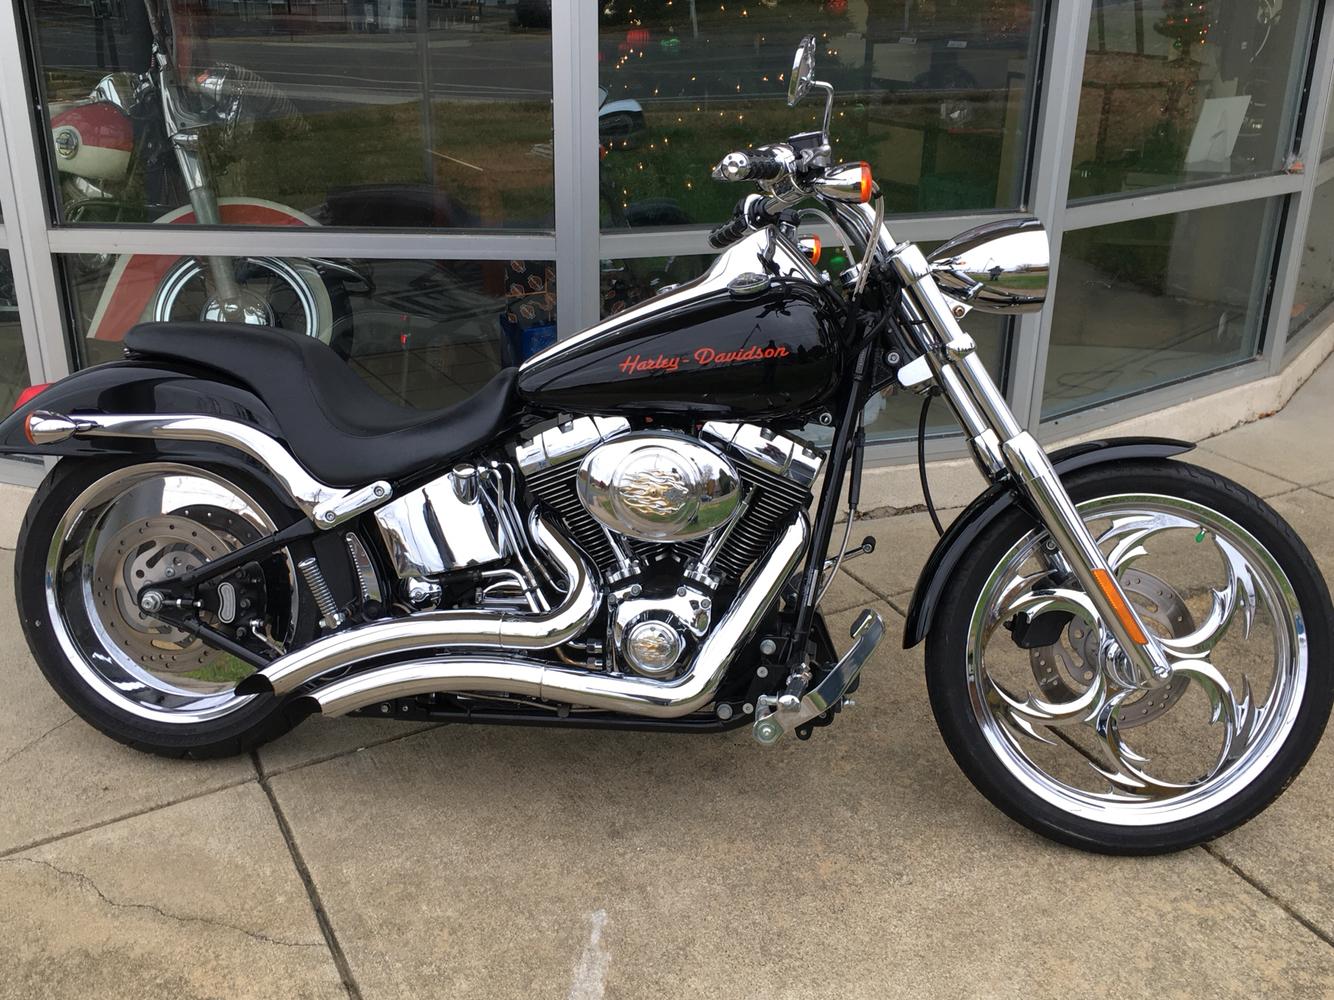 2005 Harley Davidson >> 2005 Harley Davidson Fxstd Fxstdi Softail Deuce In Dumfries Virginia